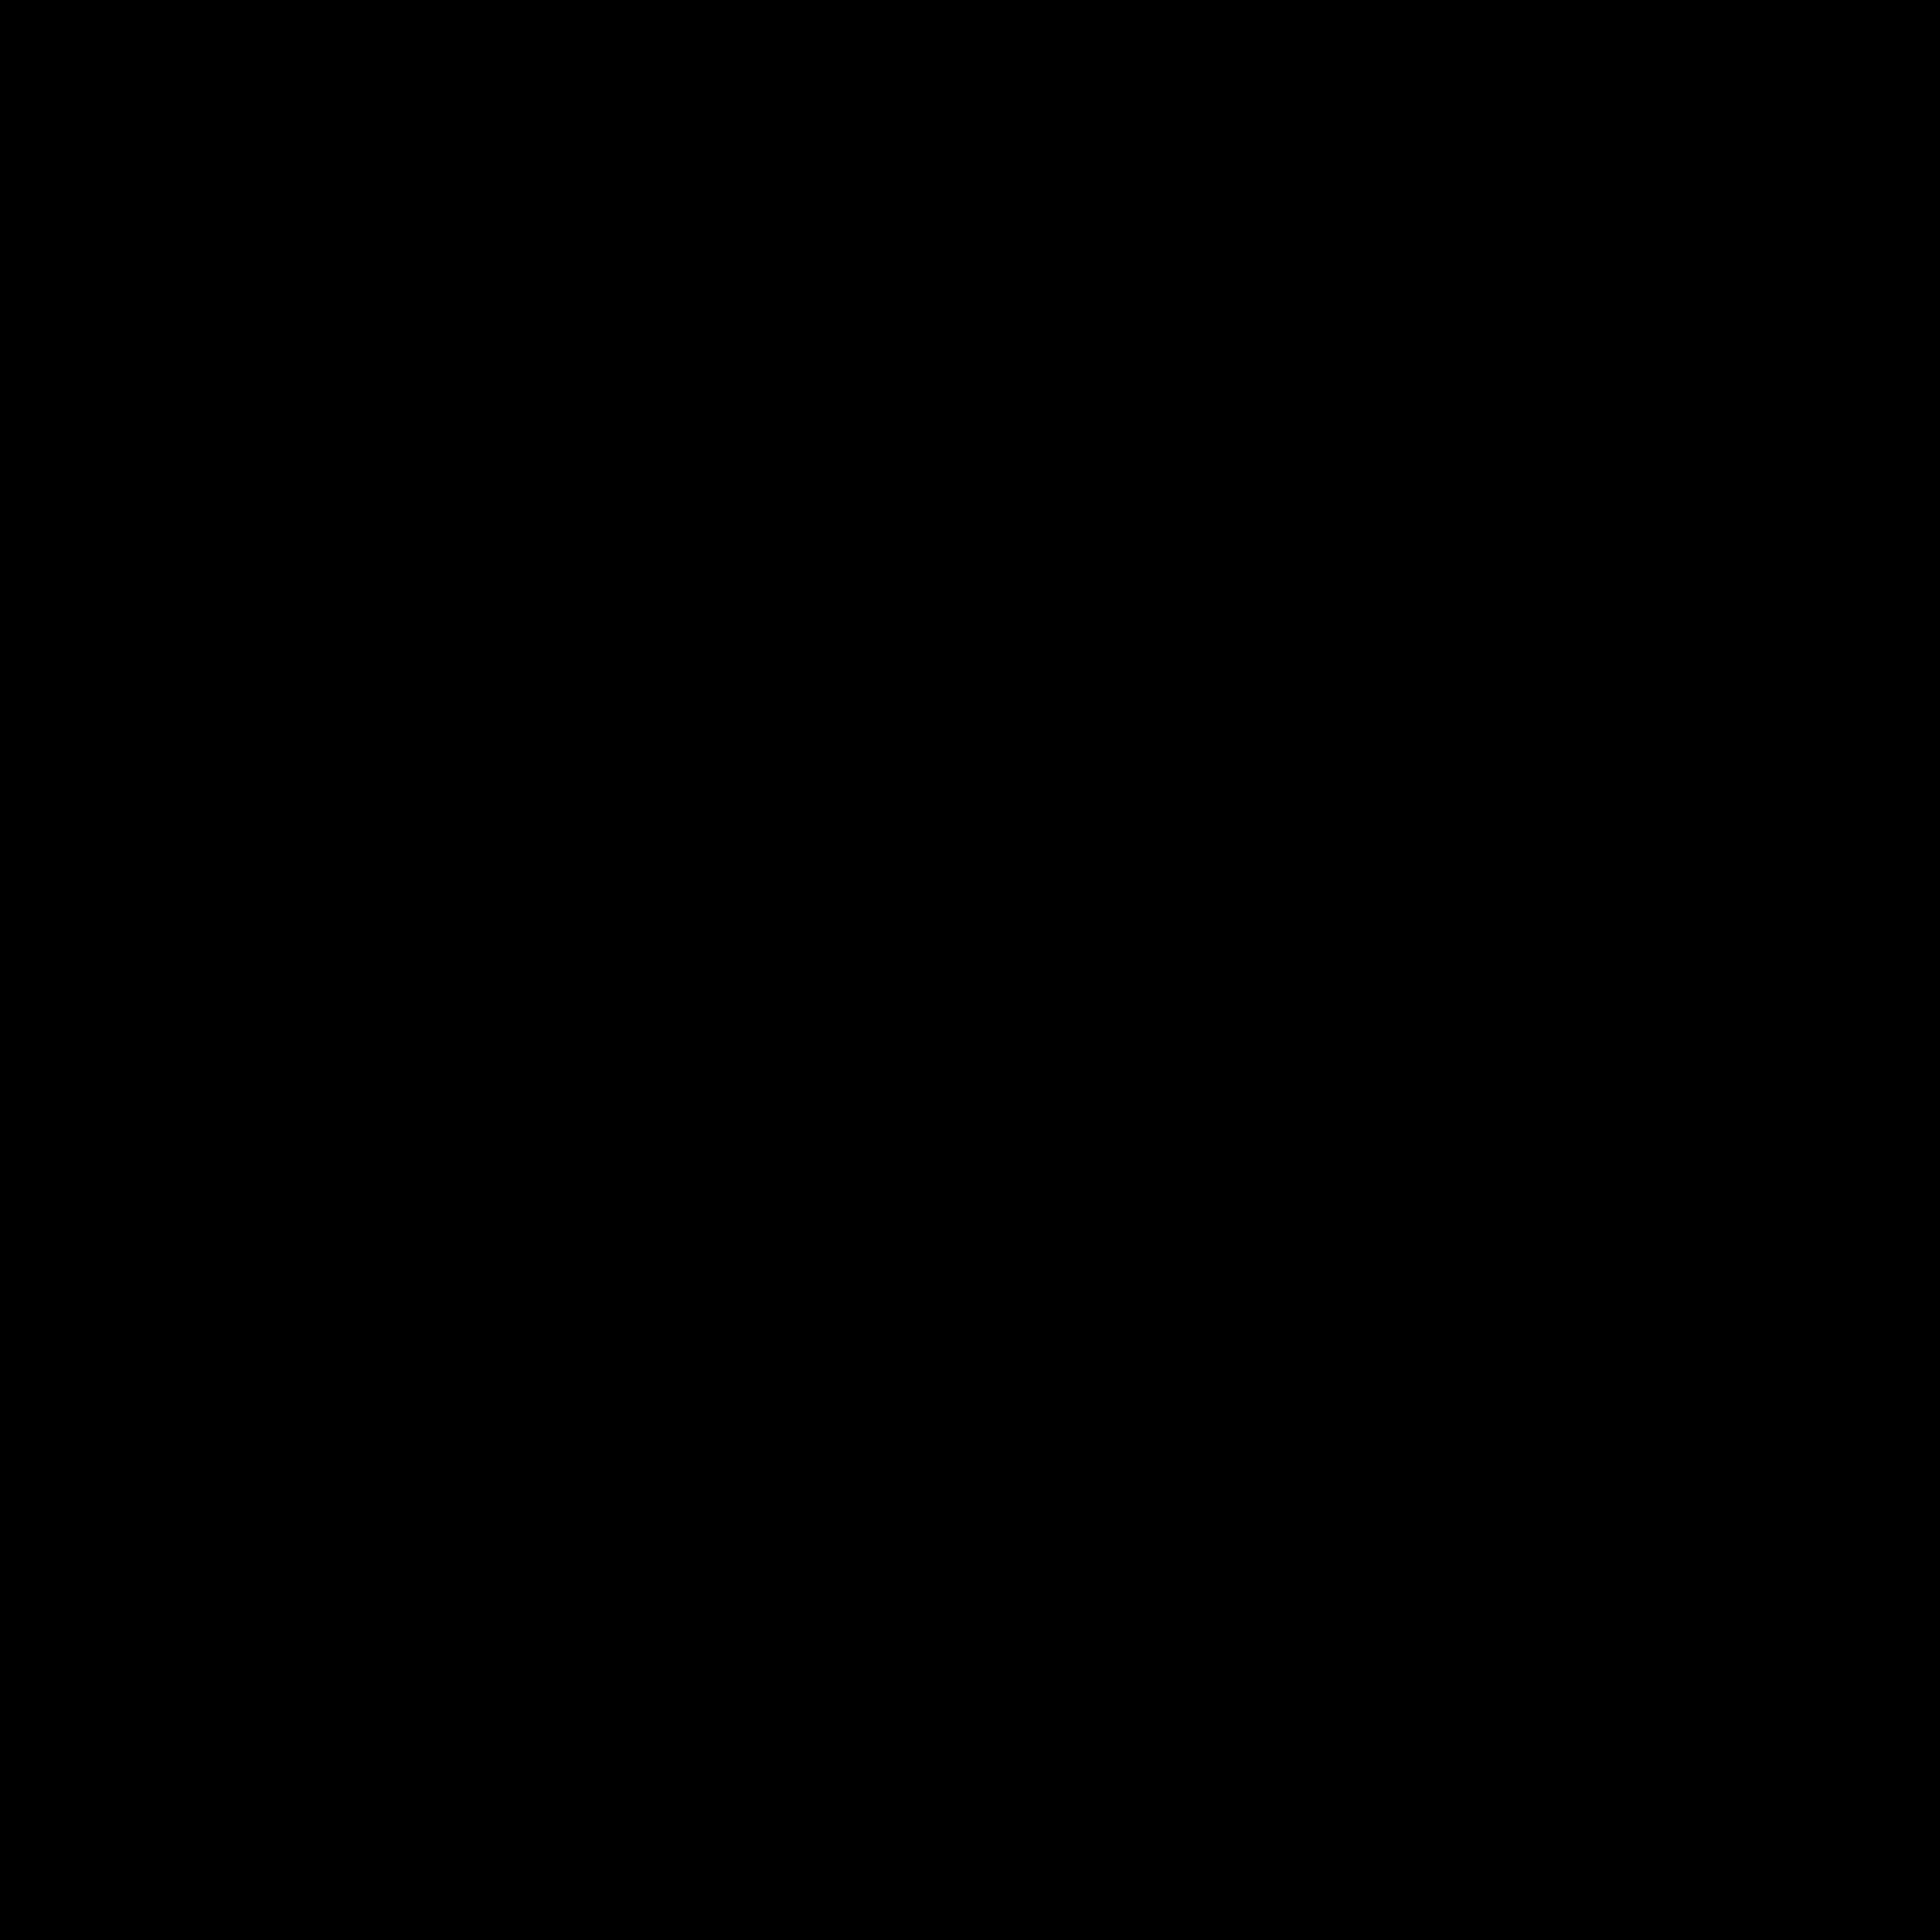 The new brand identity (logo) of Hum Azad Hai, a welfare NGO based in Aurangabad.